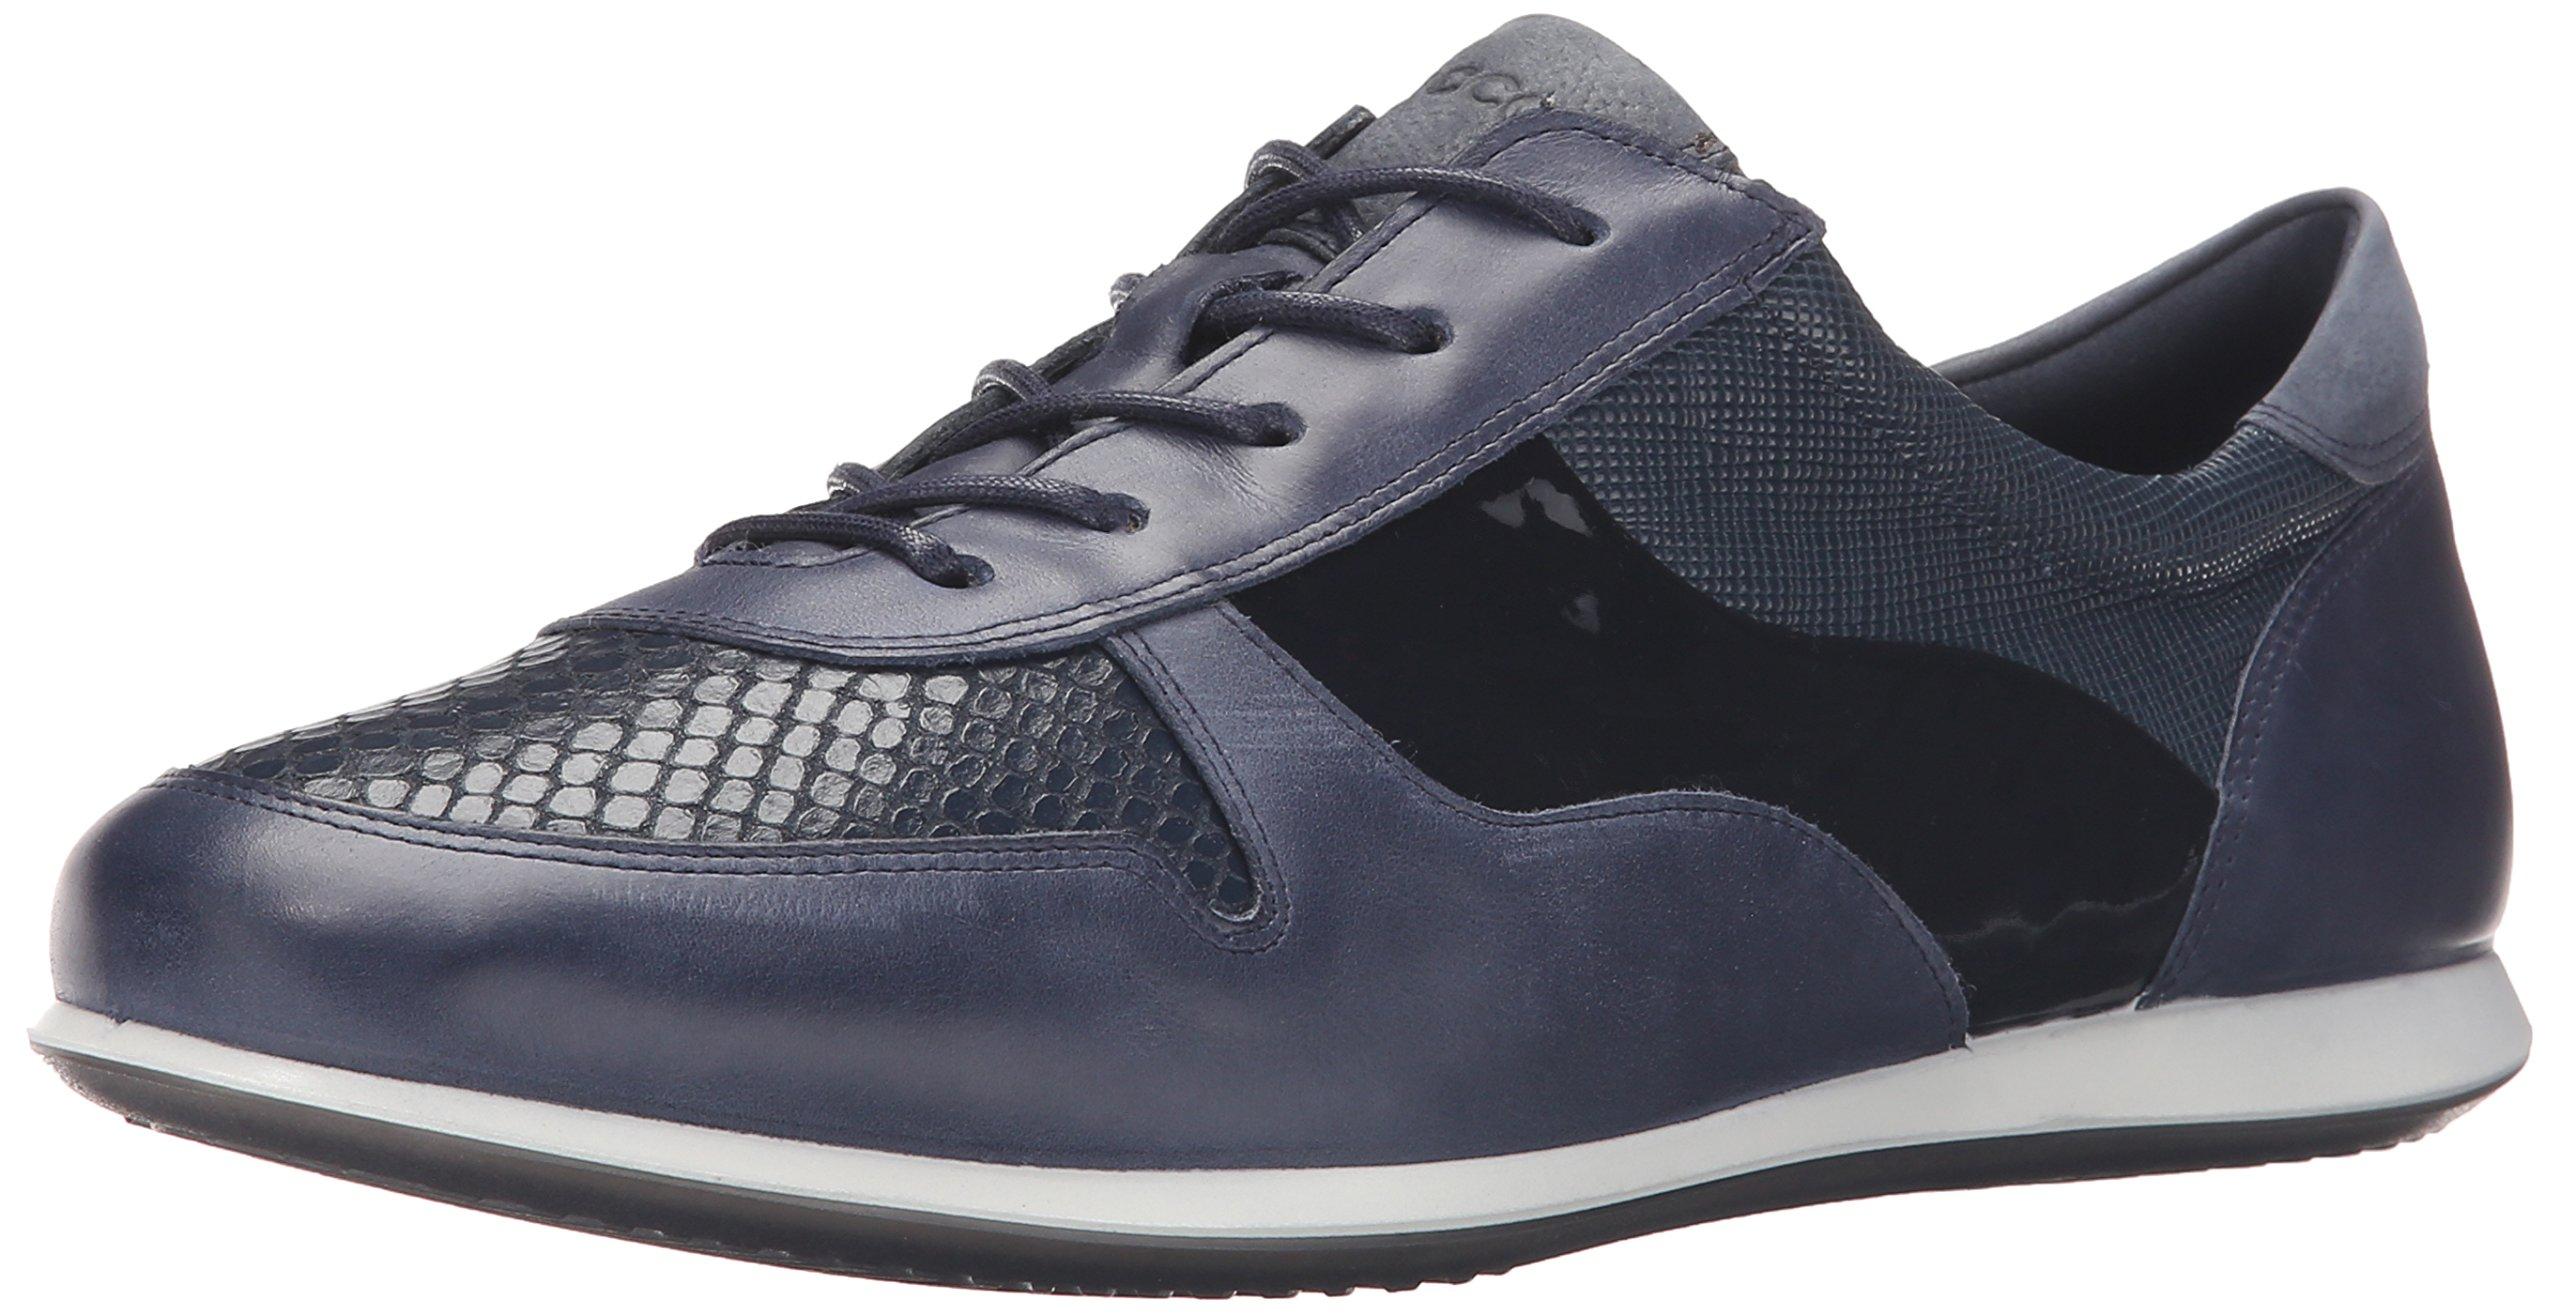 ECCO Footwear Womens Touch Tie Fashion Sneaker, Marine/Marine, 39 EU/8-8.5 M US